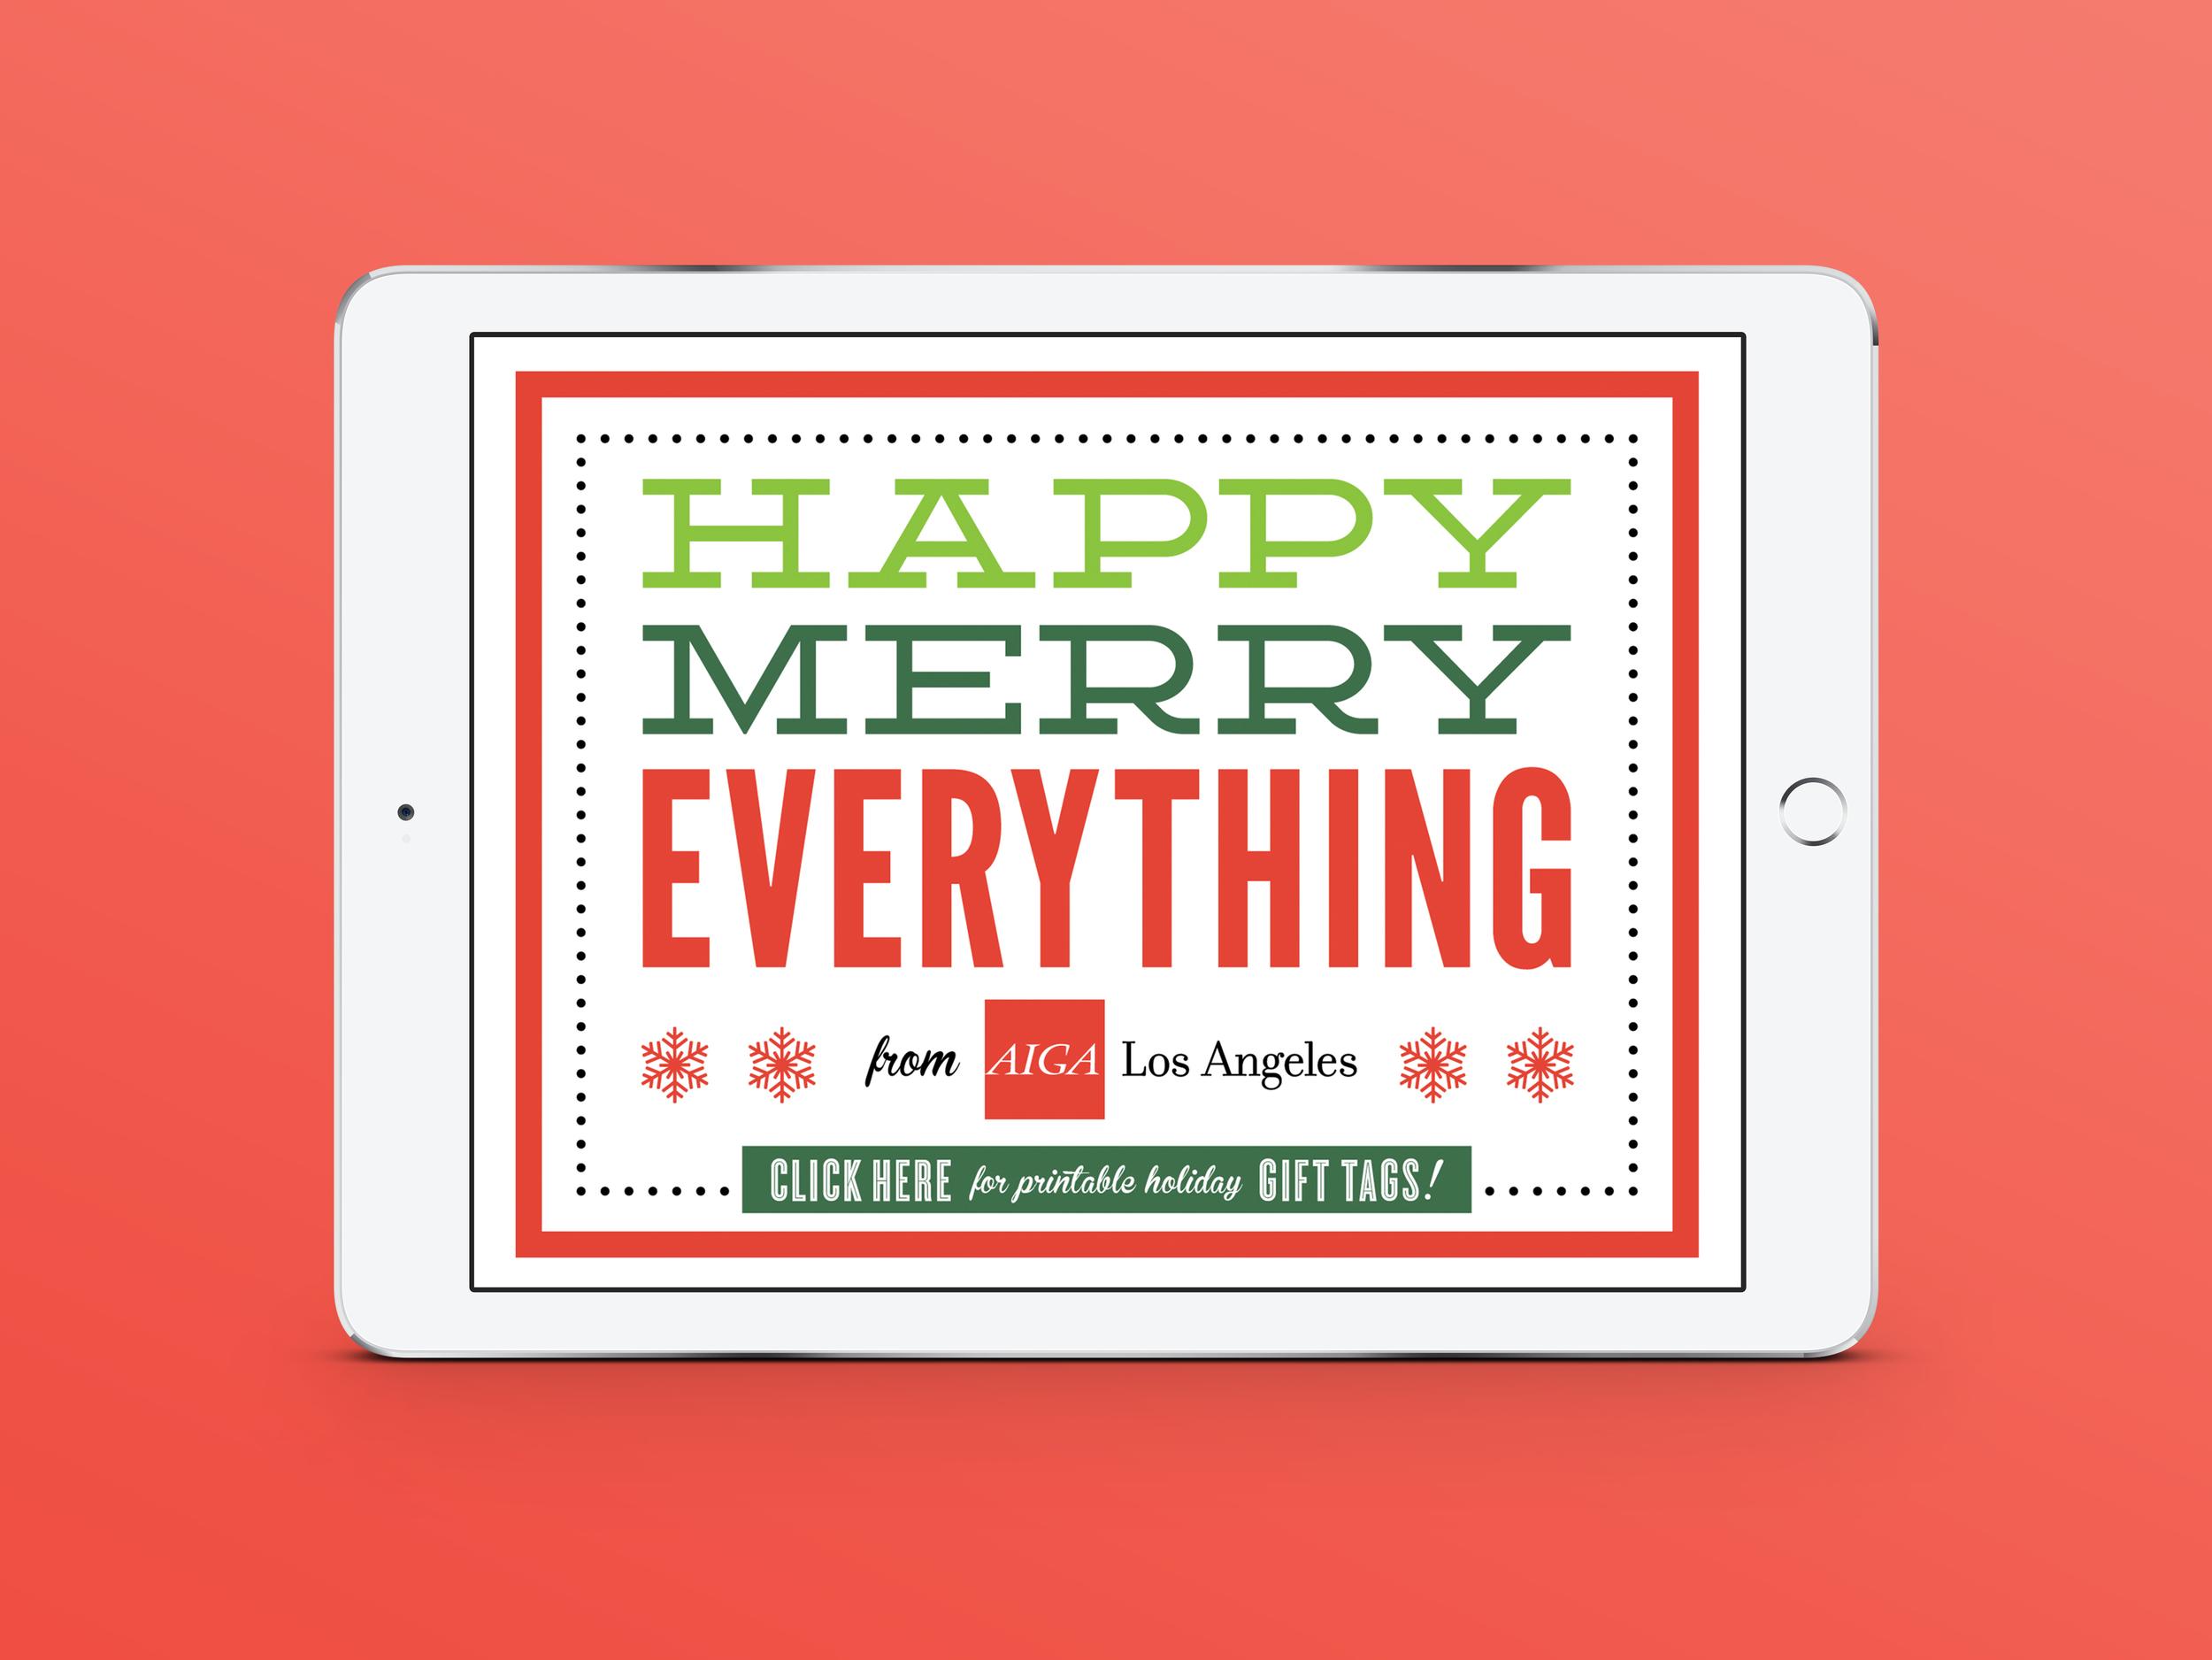 AIGAPromo_Holiday2014GiftTags_iPadMockup.jpg